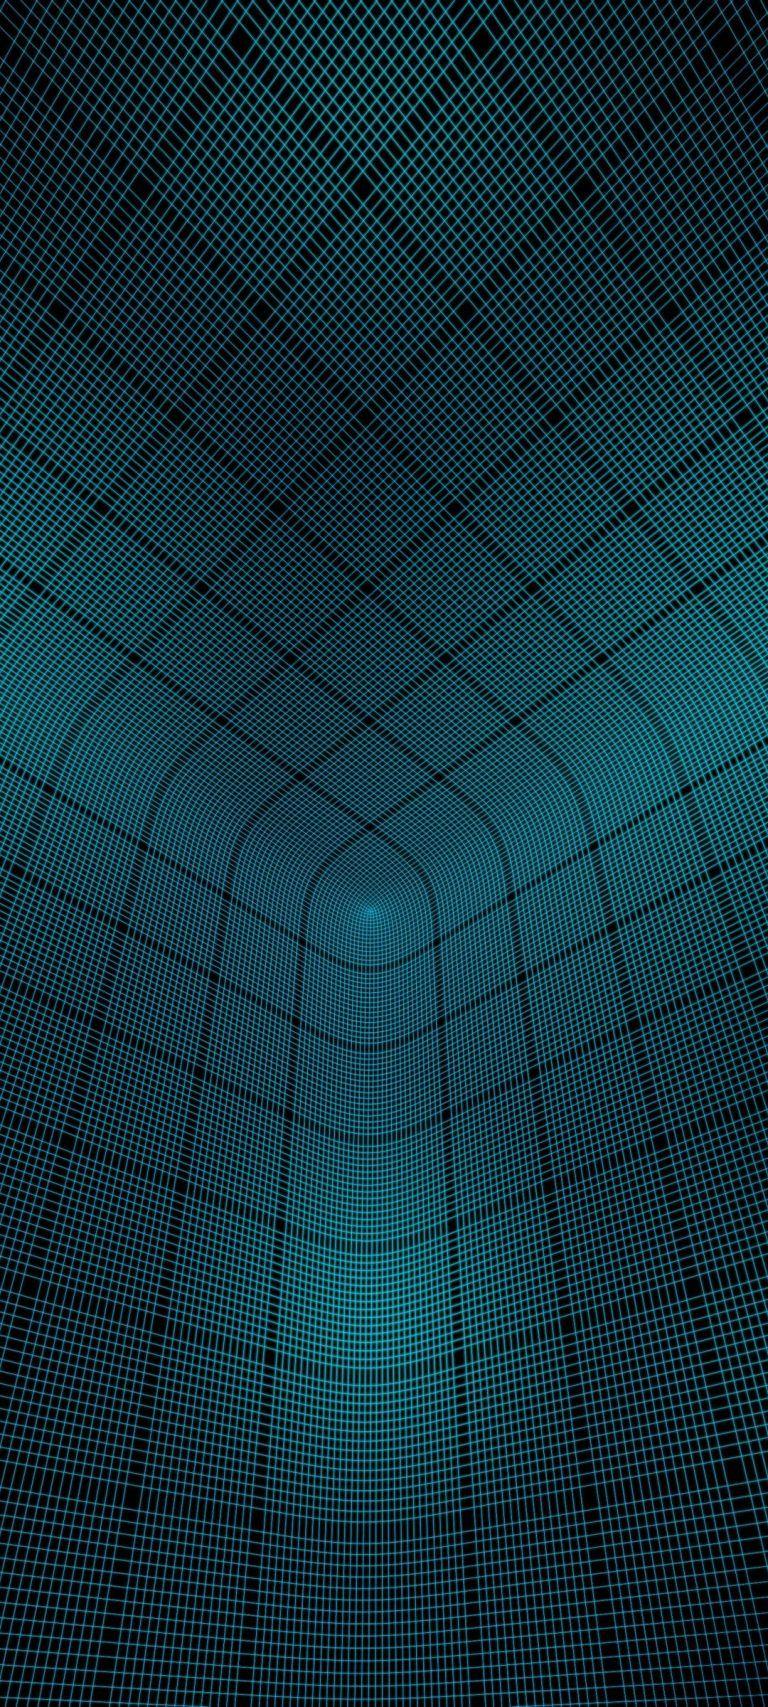 Mesh Optical Illusion Illusion 3d Wallpaper 1080 2400 In 2021 Optical Illusions Color Wallpaper Iphone Phone Wallpaper